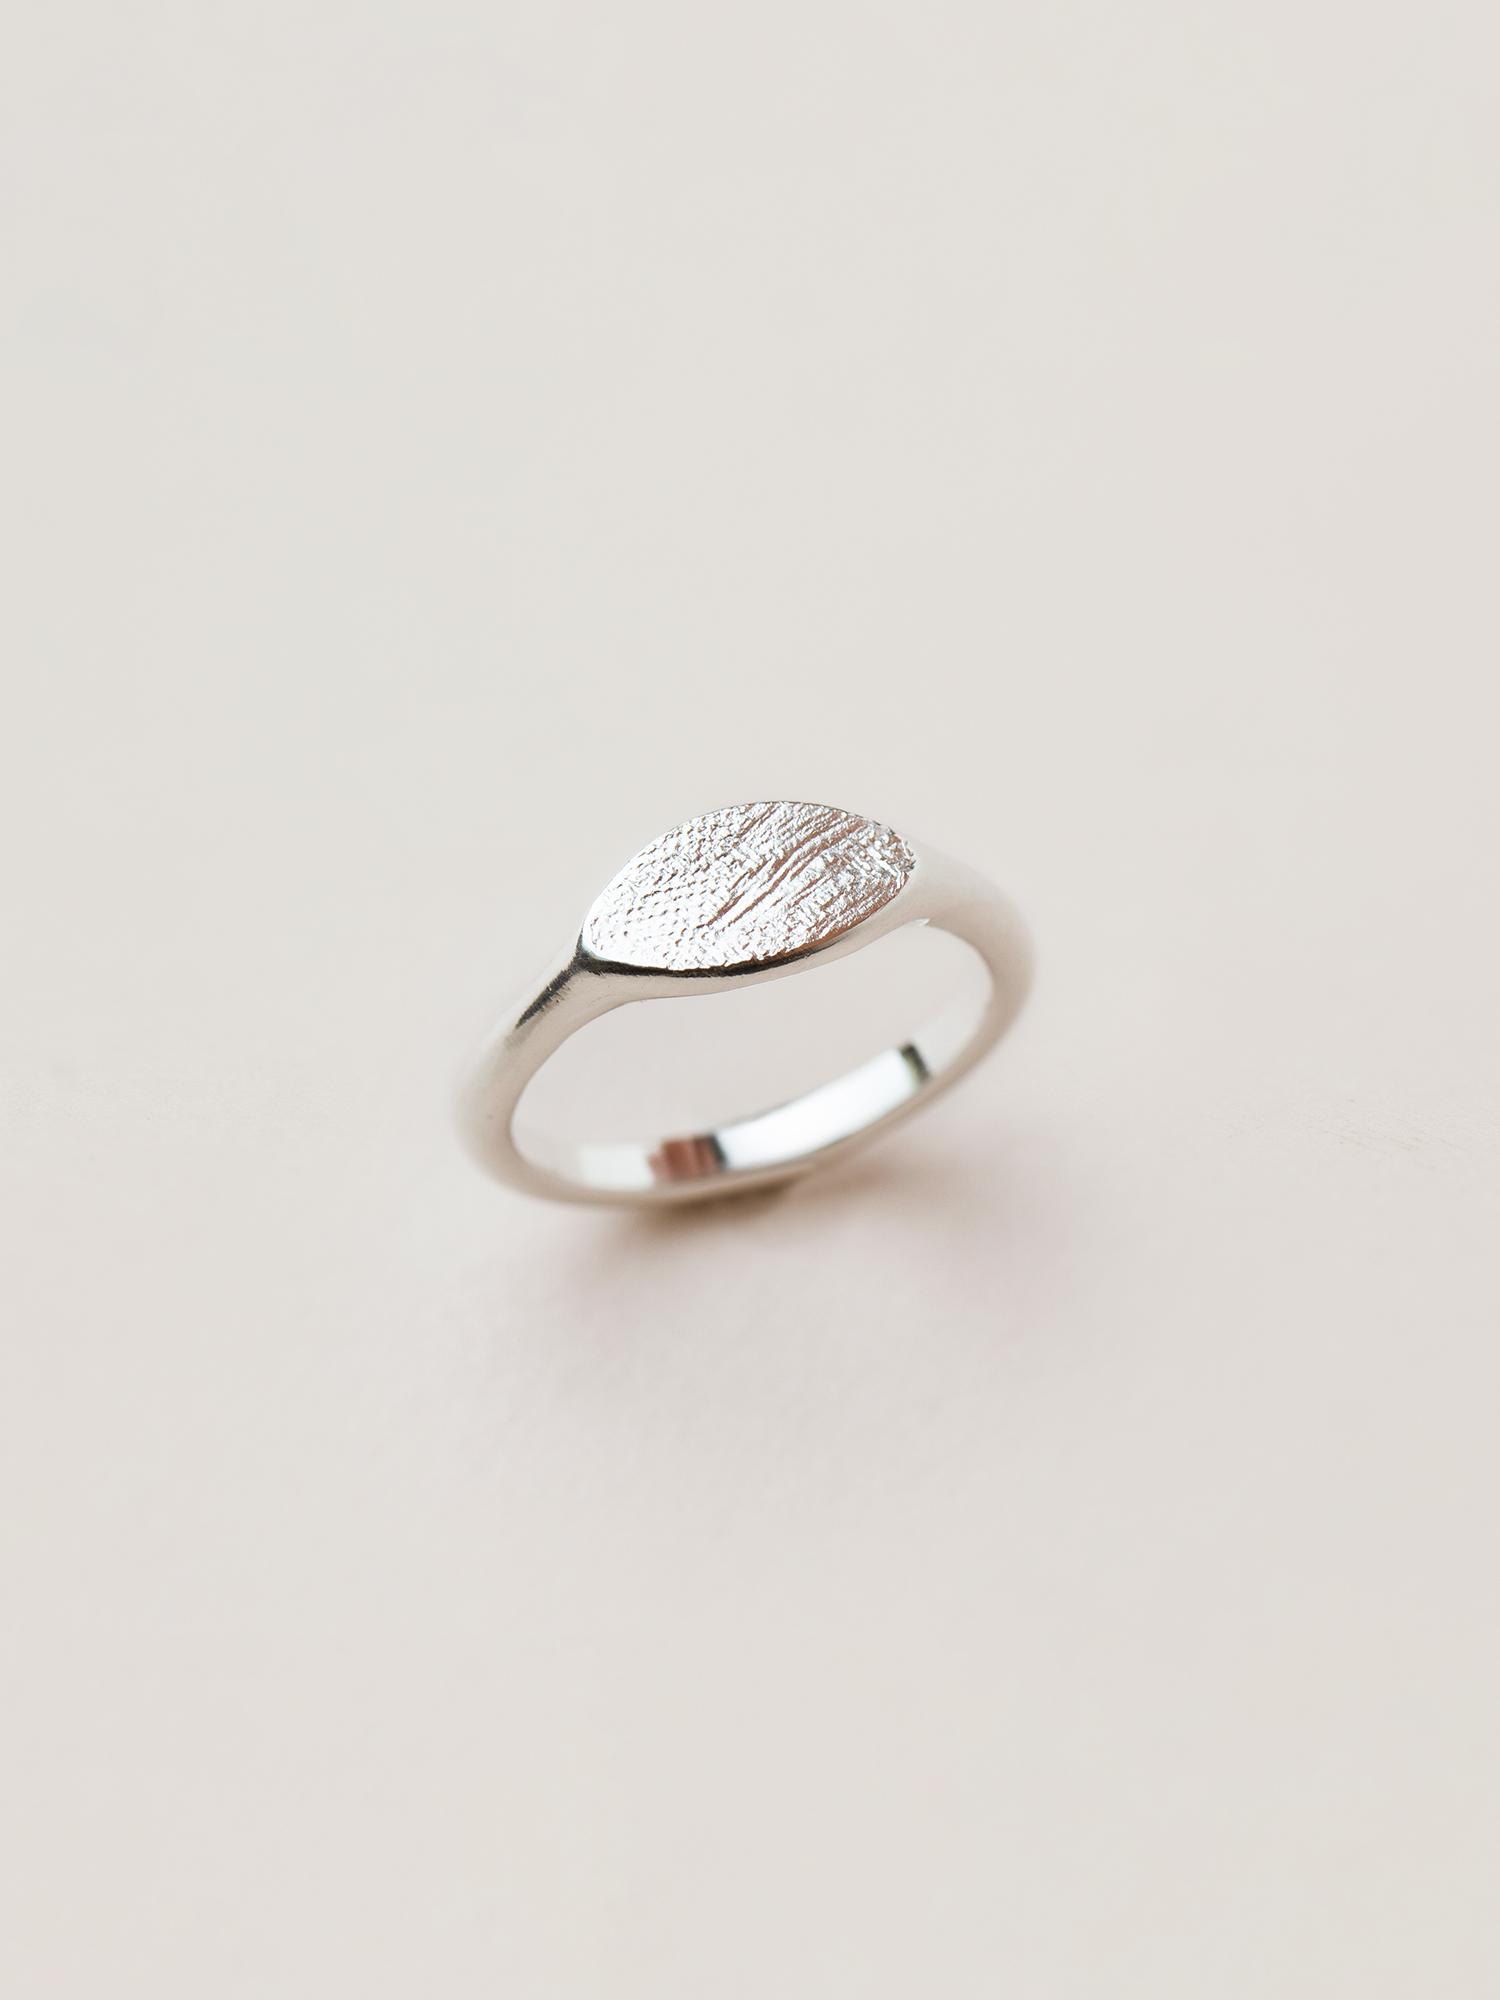 Christina-Pauls-Siegelring-oval-Struktur-Silber2.jpg